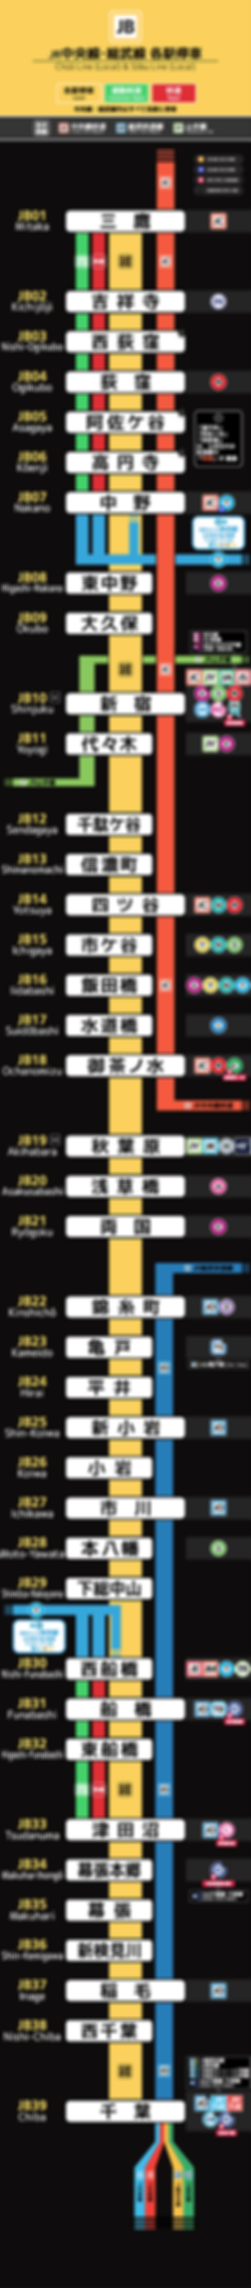 JR中央総武線各駅停車2_2020-03-01.png